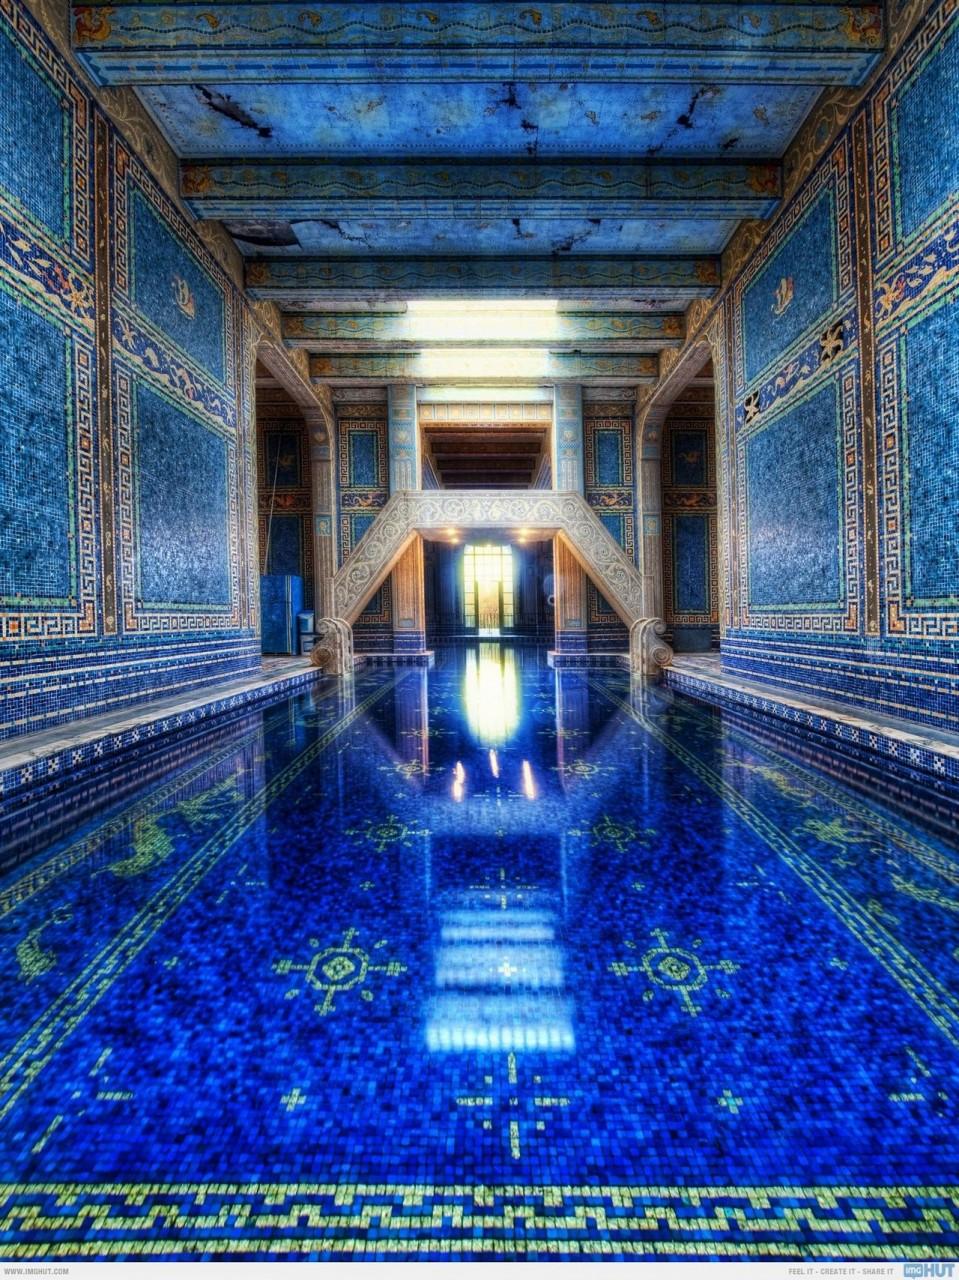 США: Замок Херста